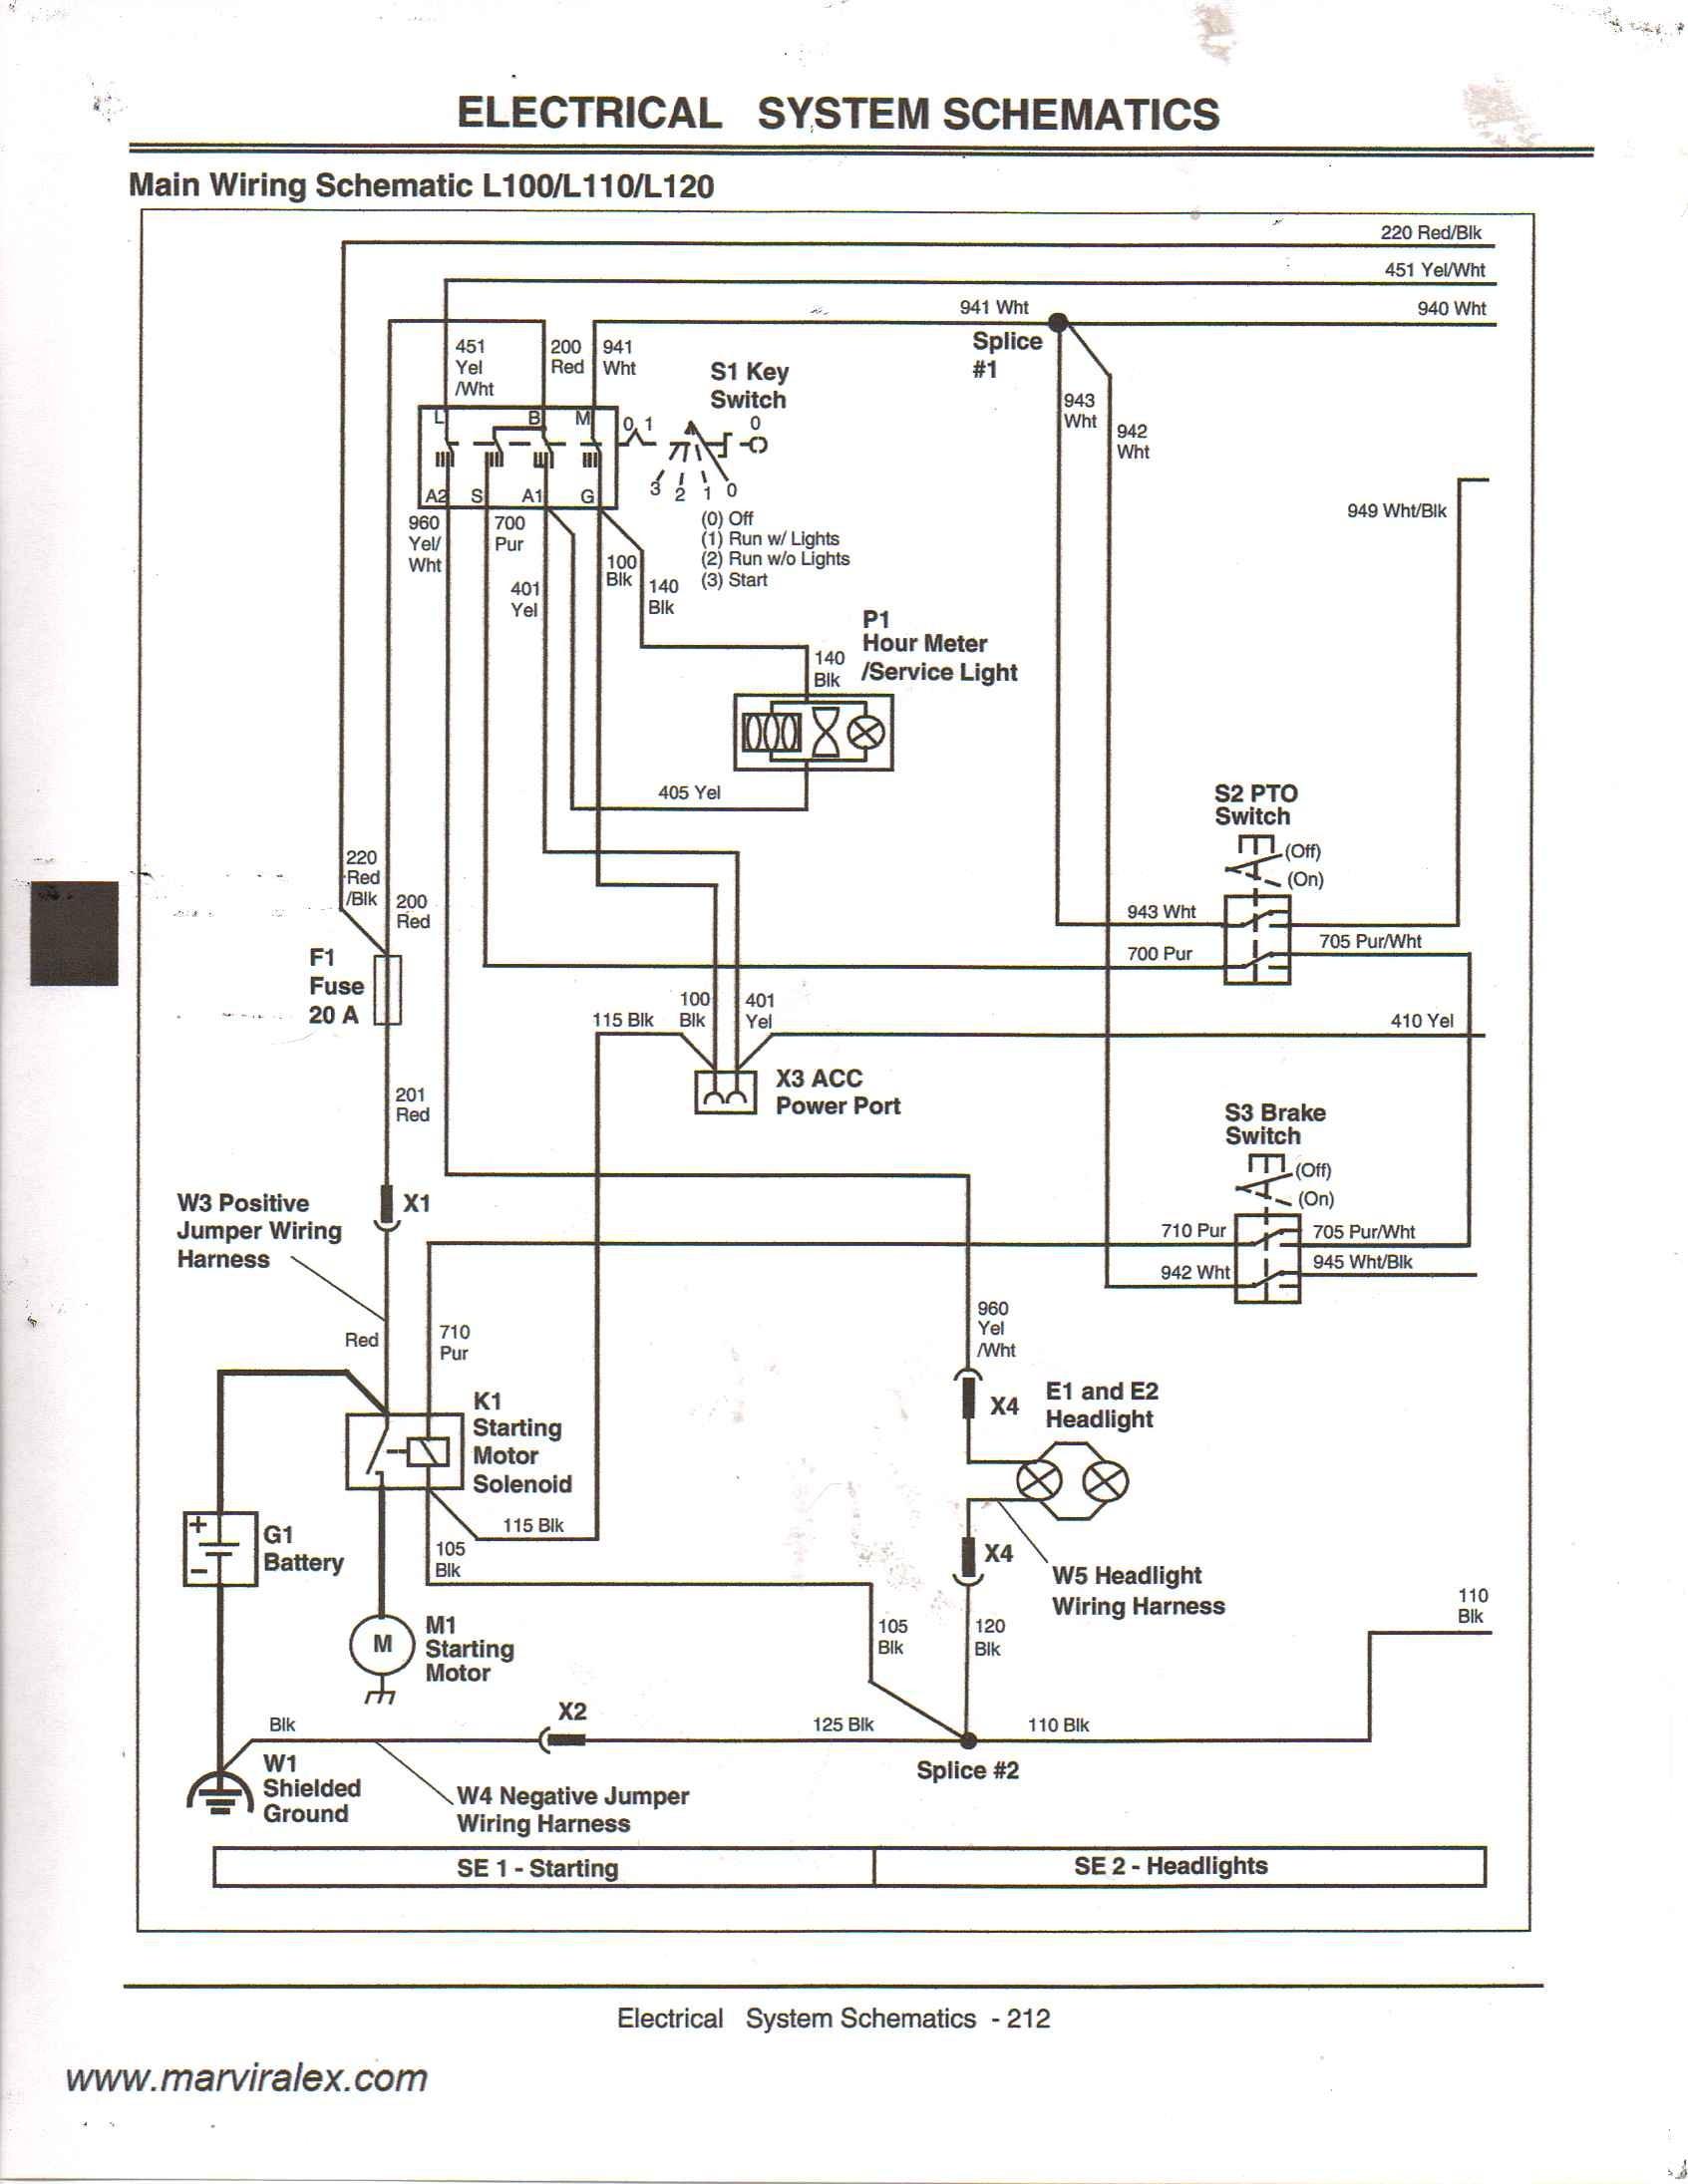 John Deere 4020 Wiring Schematics Cb 4290] for John Deere 1050 Tractor Wiring Diagram Of John Deere 4020 Wiring Schematics